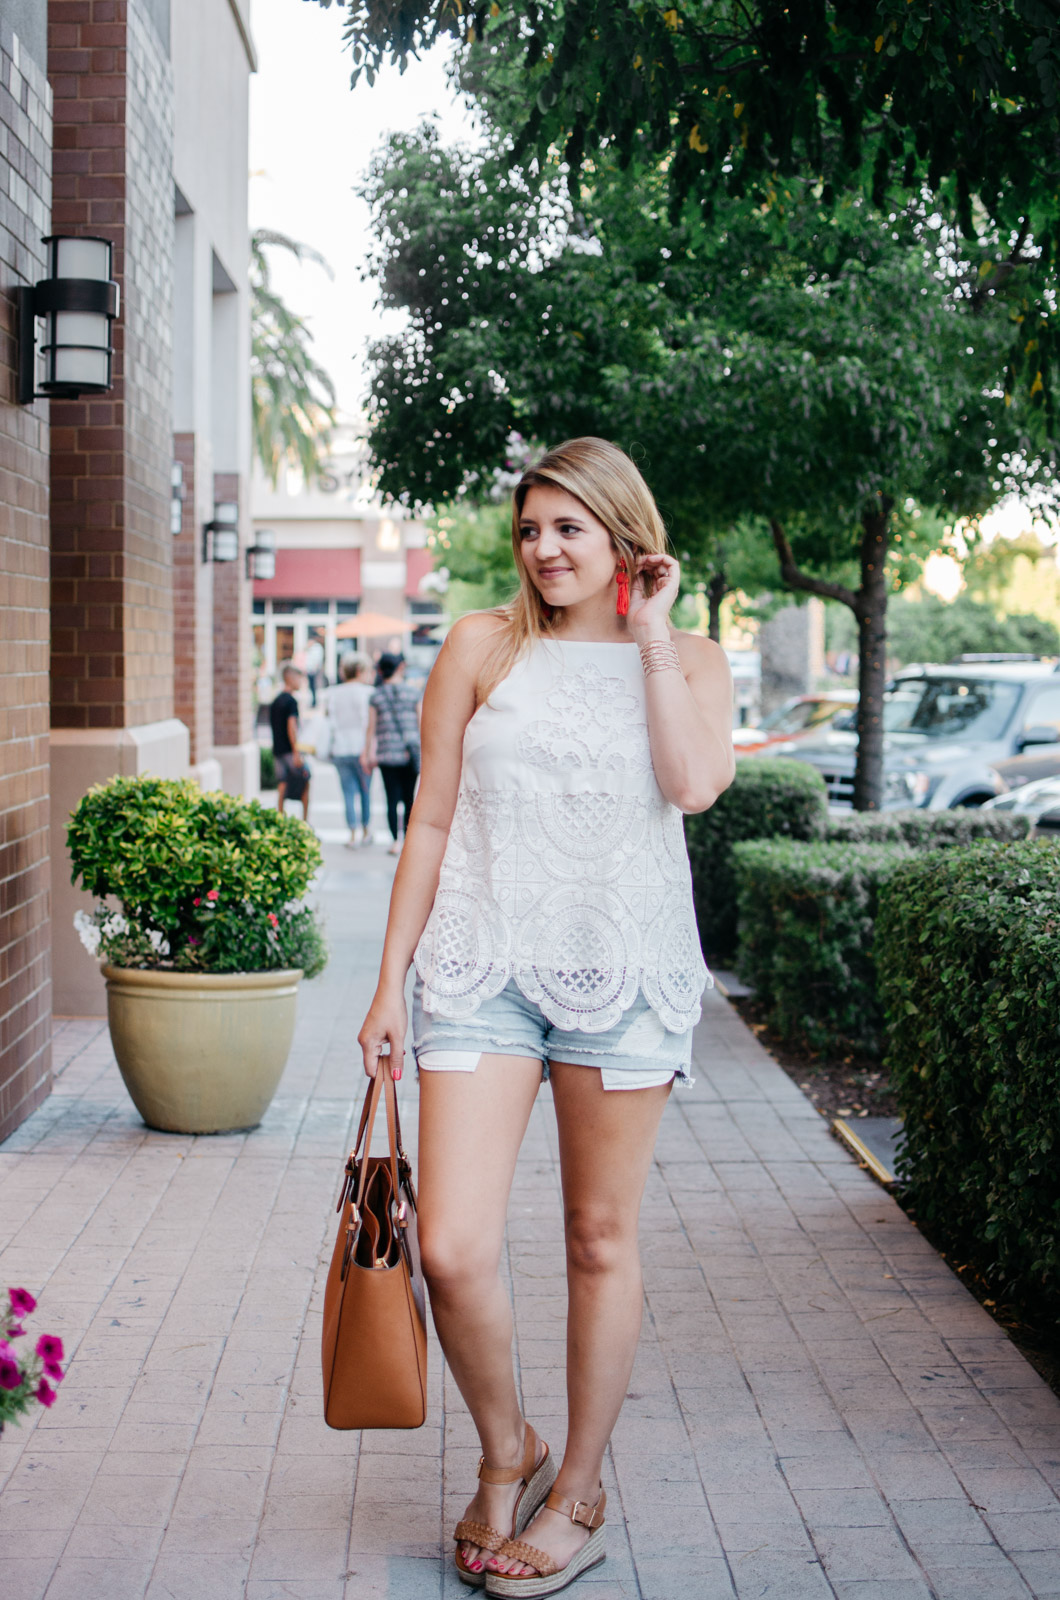 cute summer outfit idea - best cutoff denim shorts | For more cute summer outfit ideas, head to bylaurenm.com!